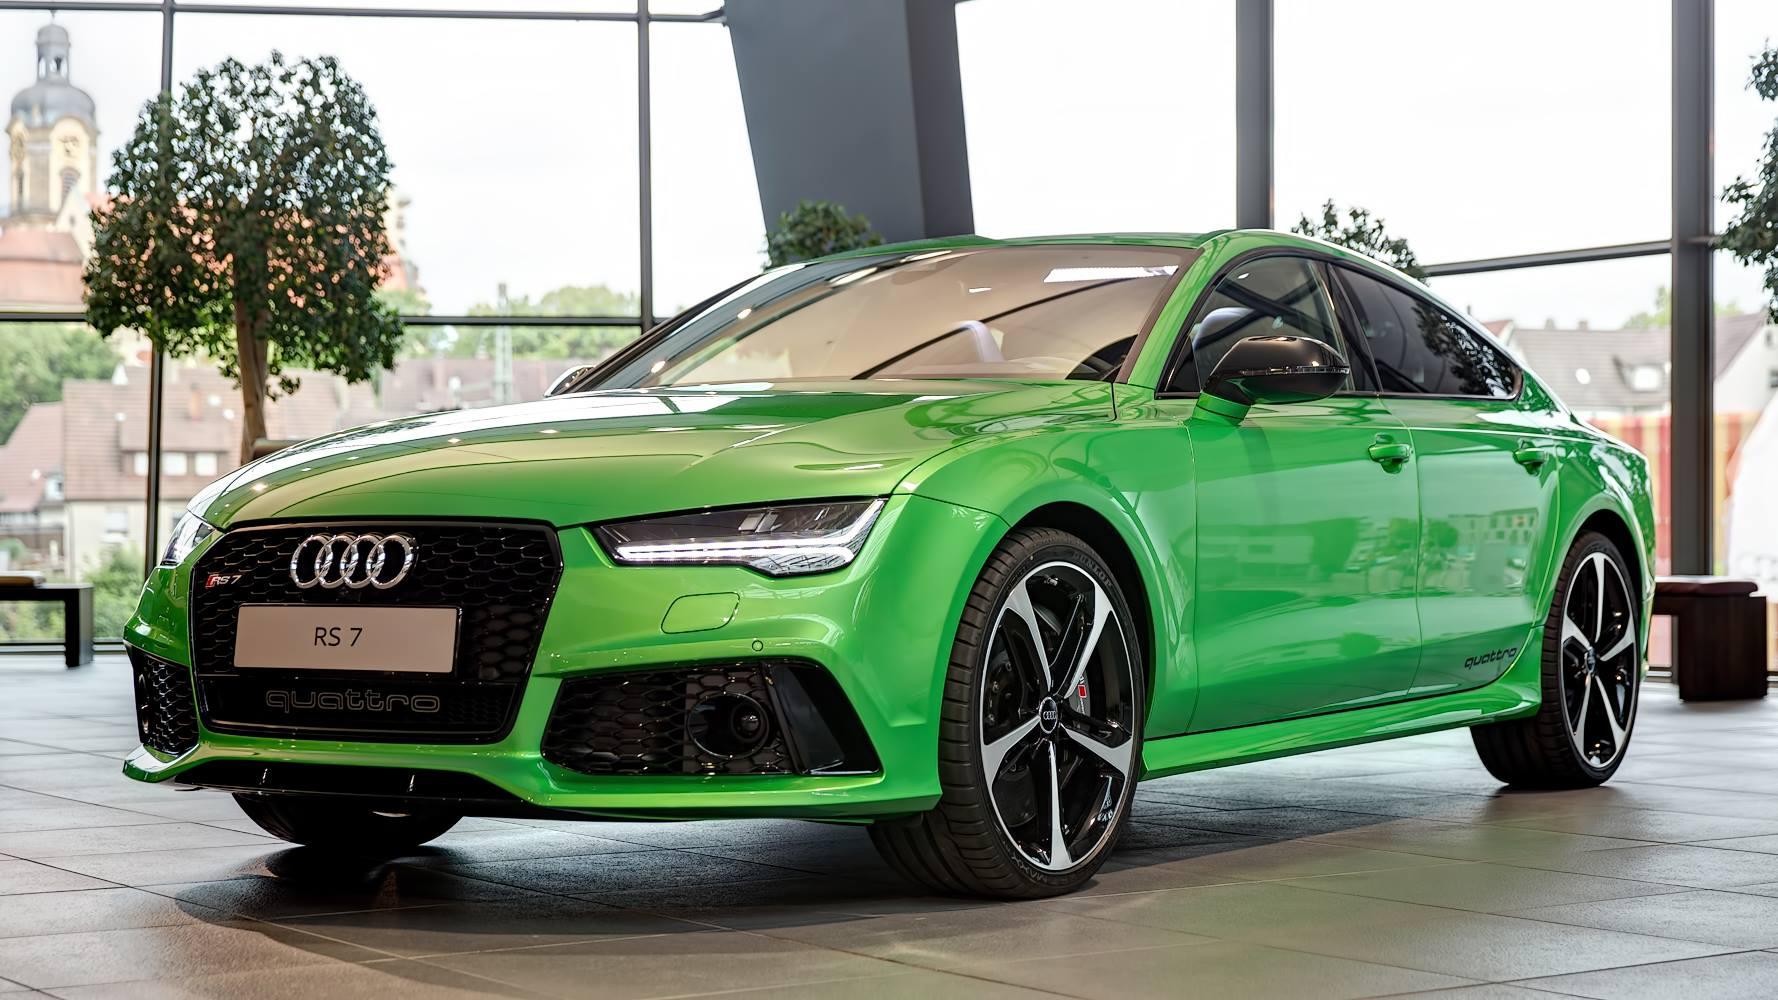 Audi Rs7 2014 For Sale >> Unique Apple Green Metallic Audi RS7 Sportback in Germany - GTspirit